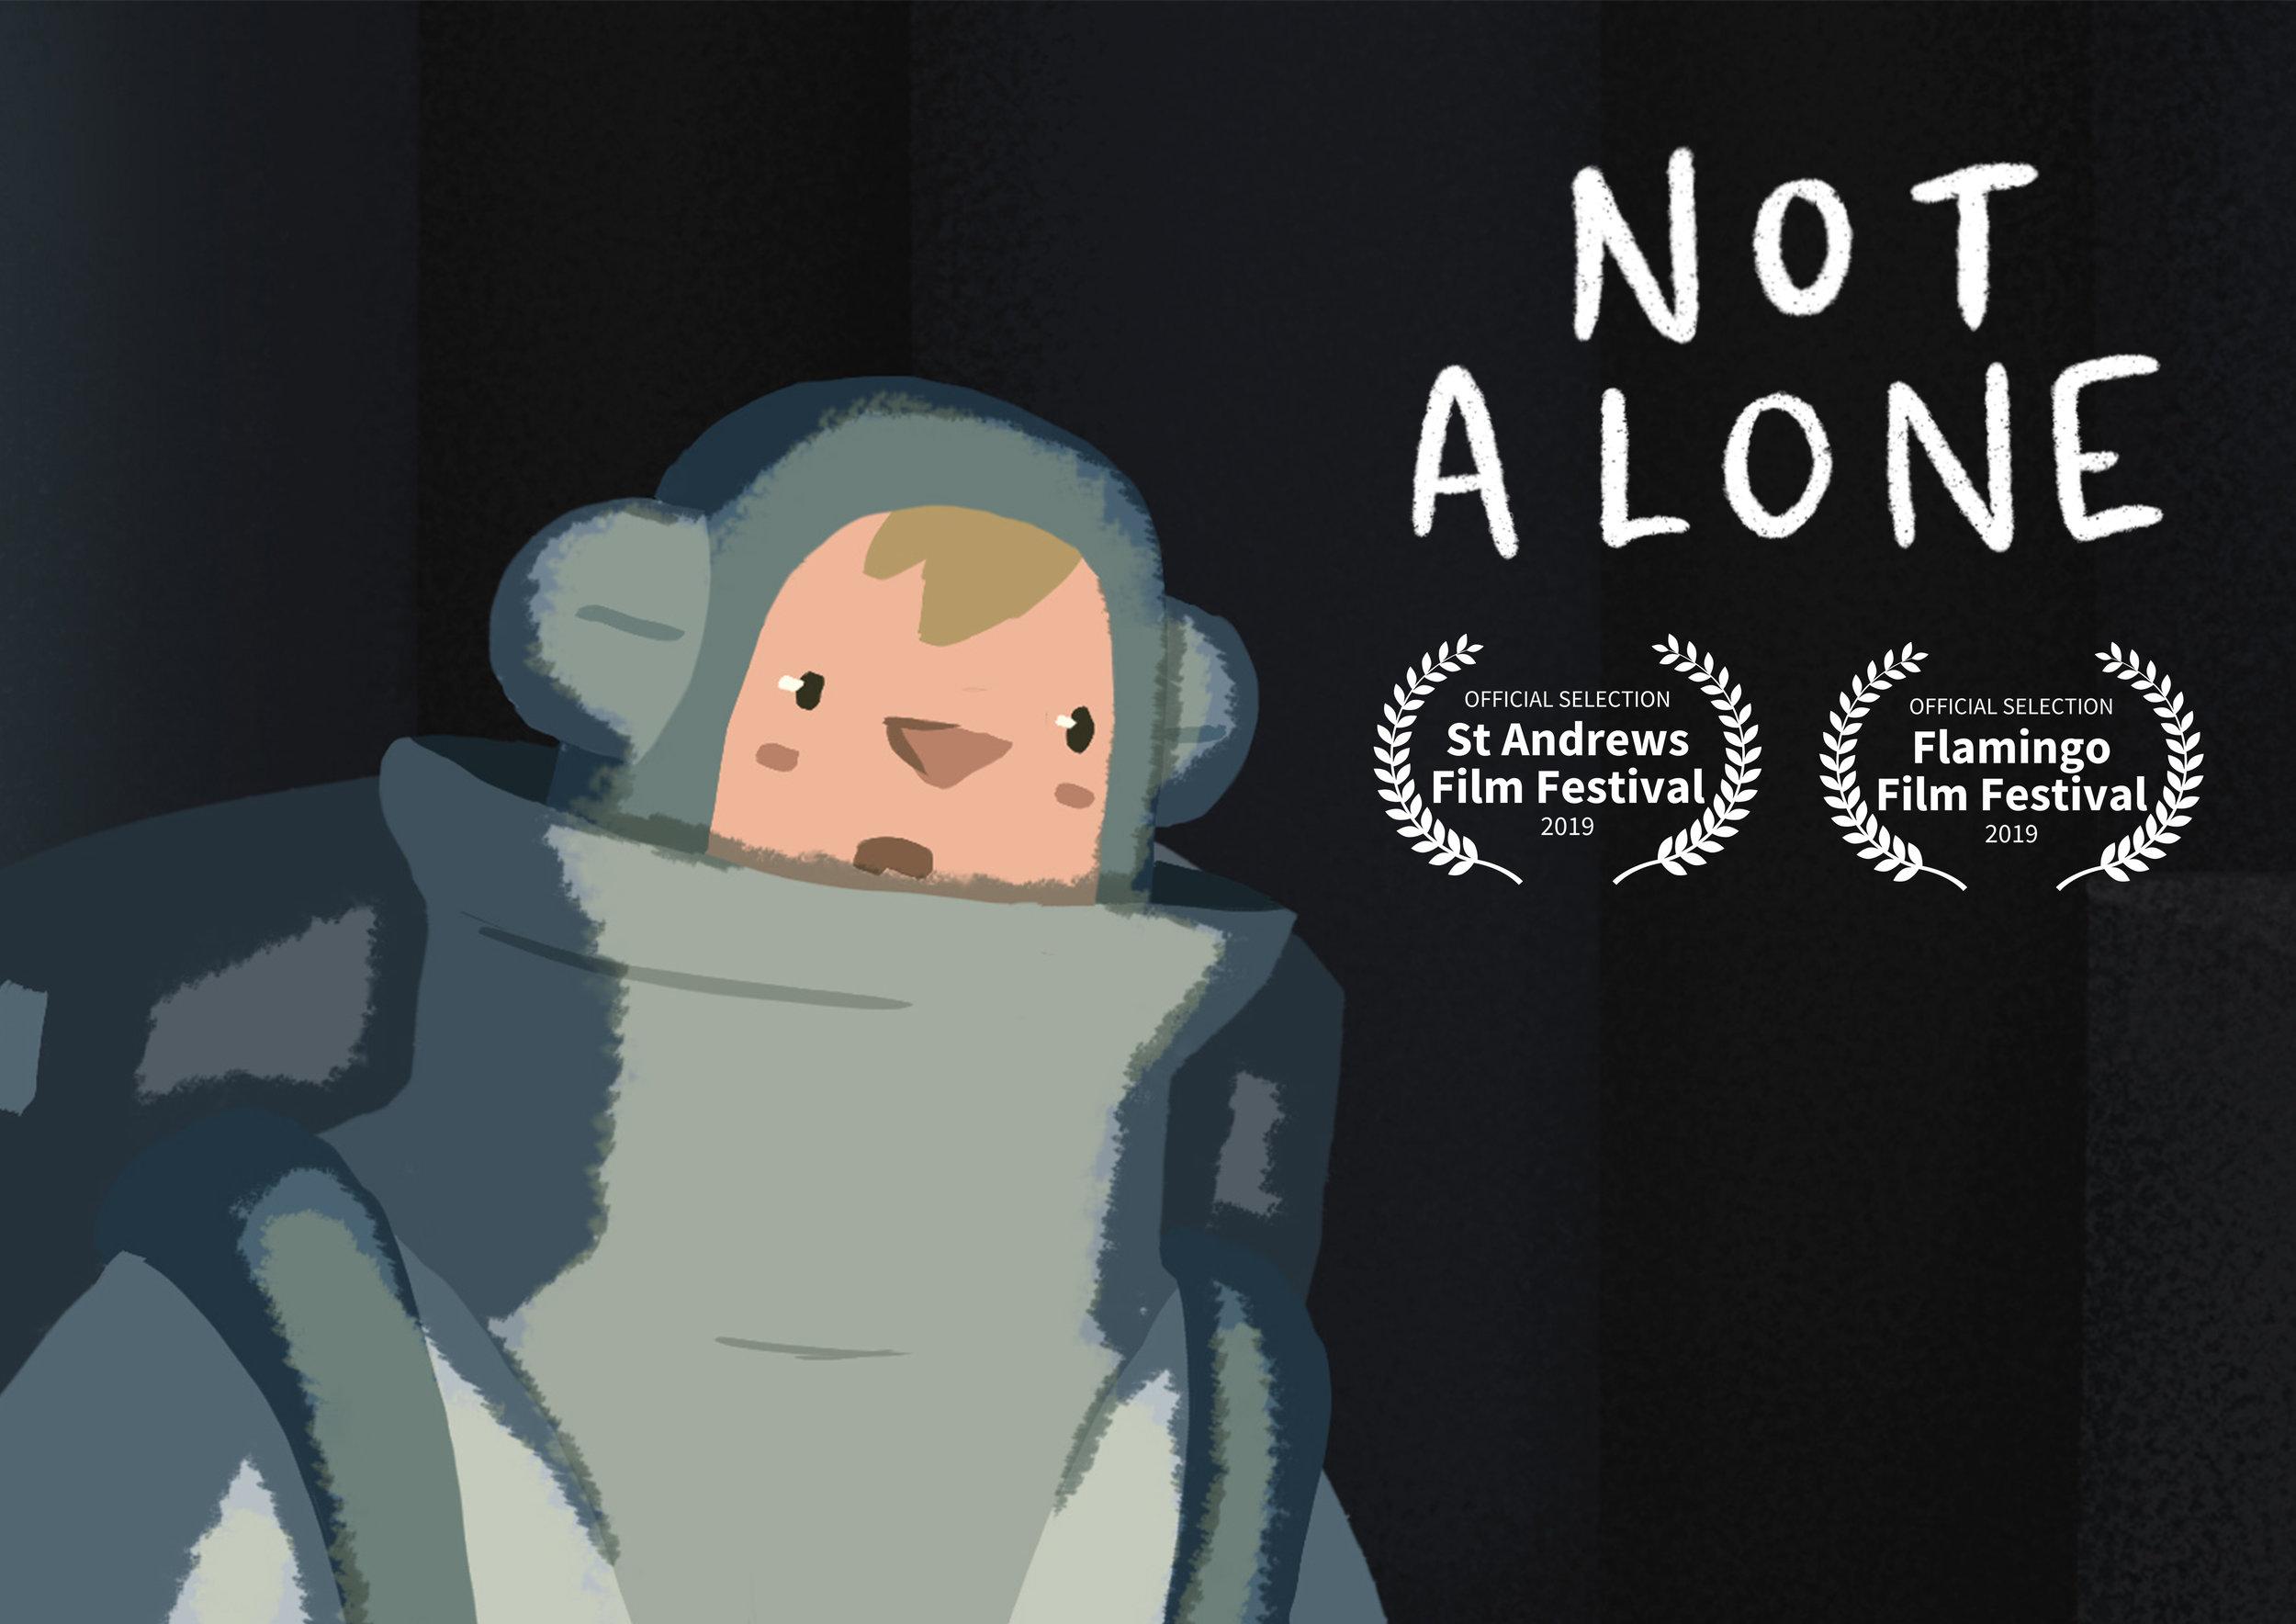 not alone poster 2.jpg